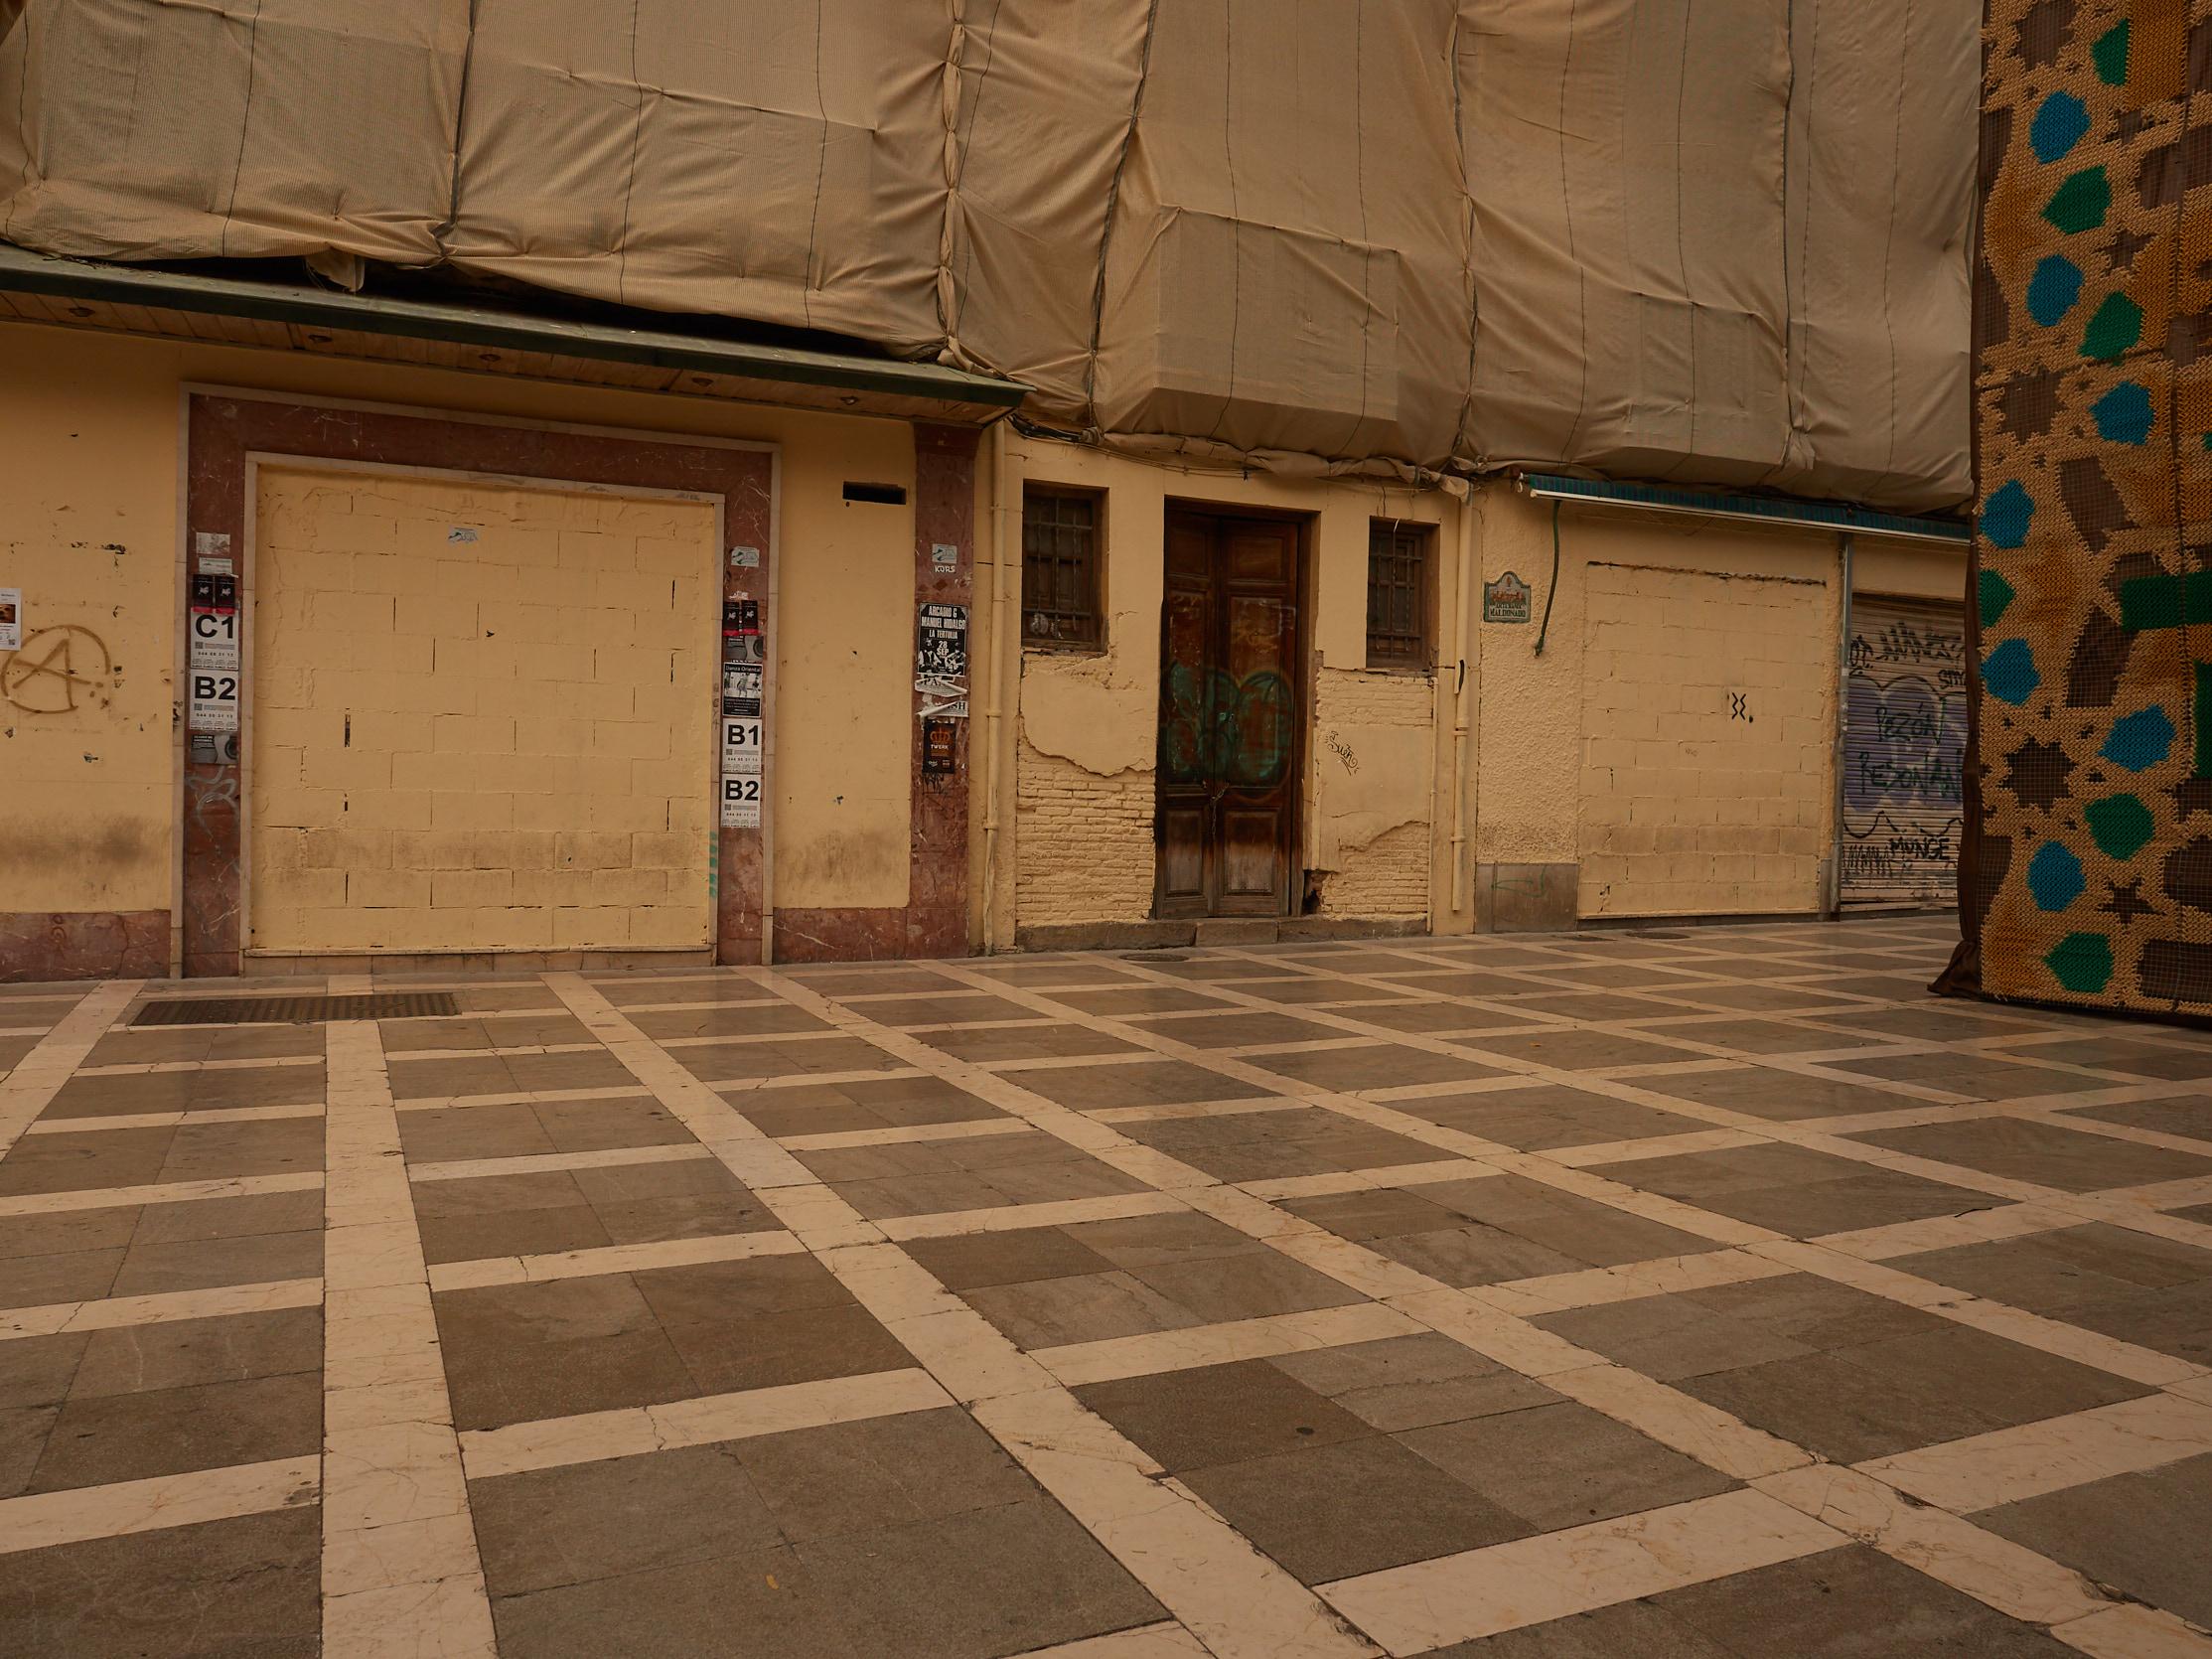 Trauriger Anblick am Plaza Nueva ohne John's Bilder (2018)